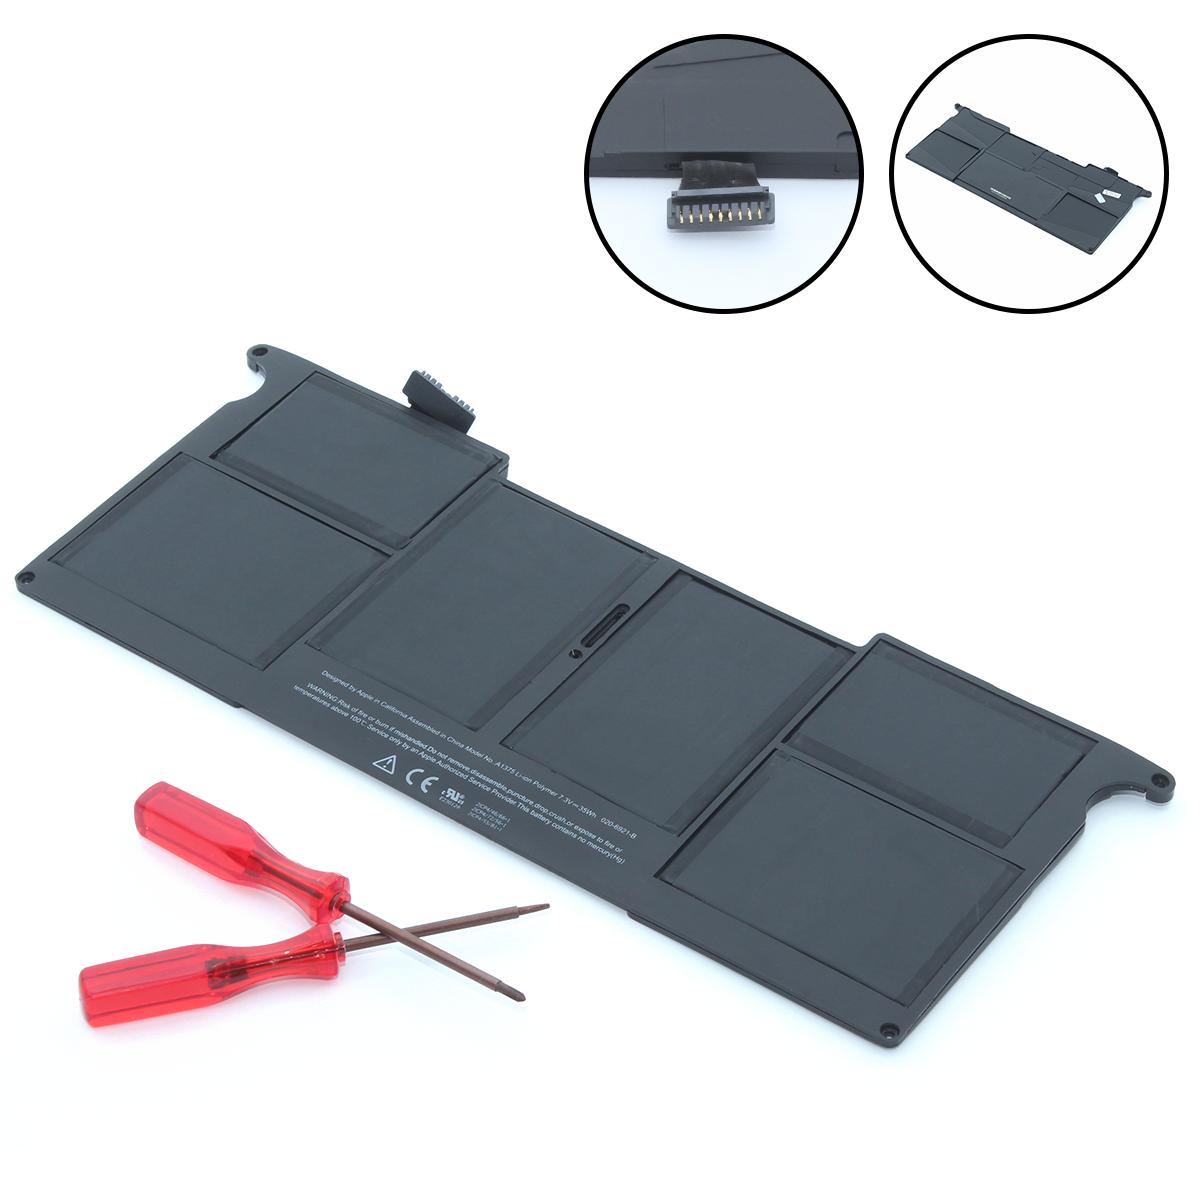 "Батарея, аккумулятор для MacBook Air 11"" 2010 (A1370)"